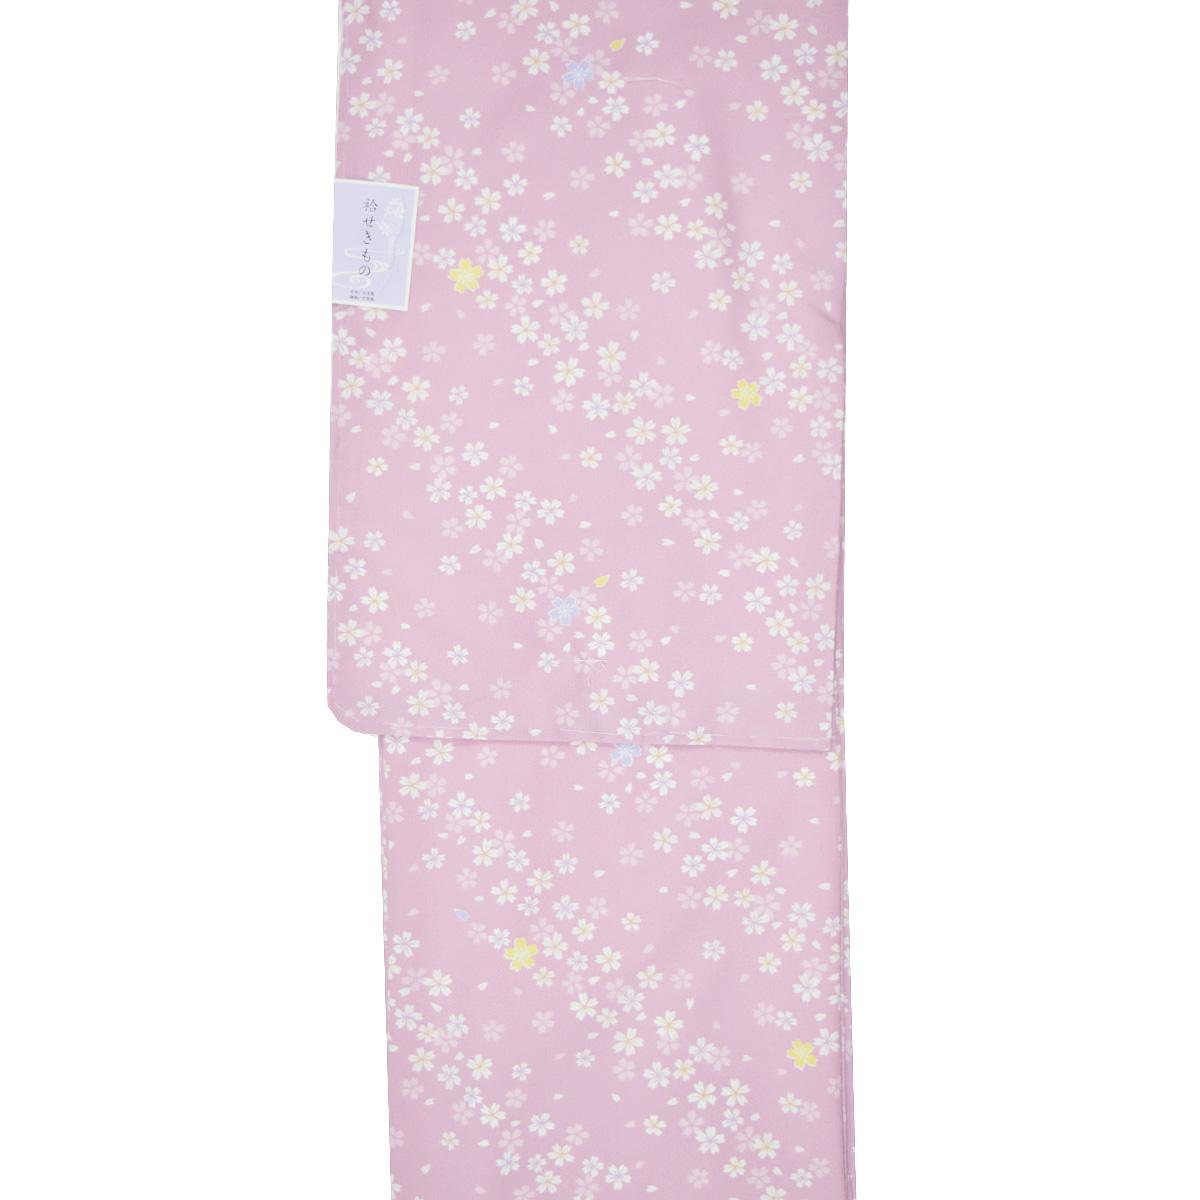 【L寸】洗える着物 単品【袷】仕立て上り着物 普段着 お洒落 和服 小紋 花柄 ピンク番号d212-24【2019_9ss】